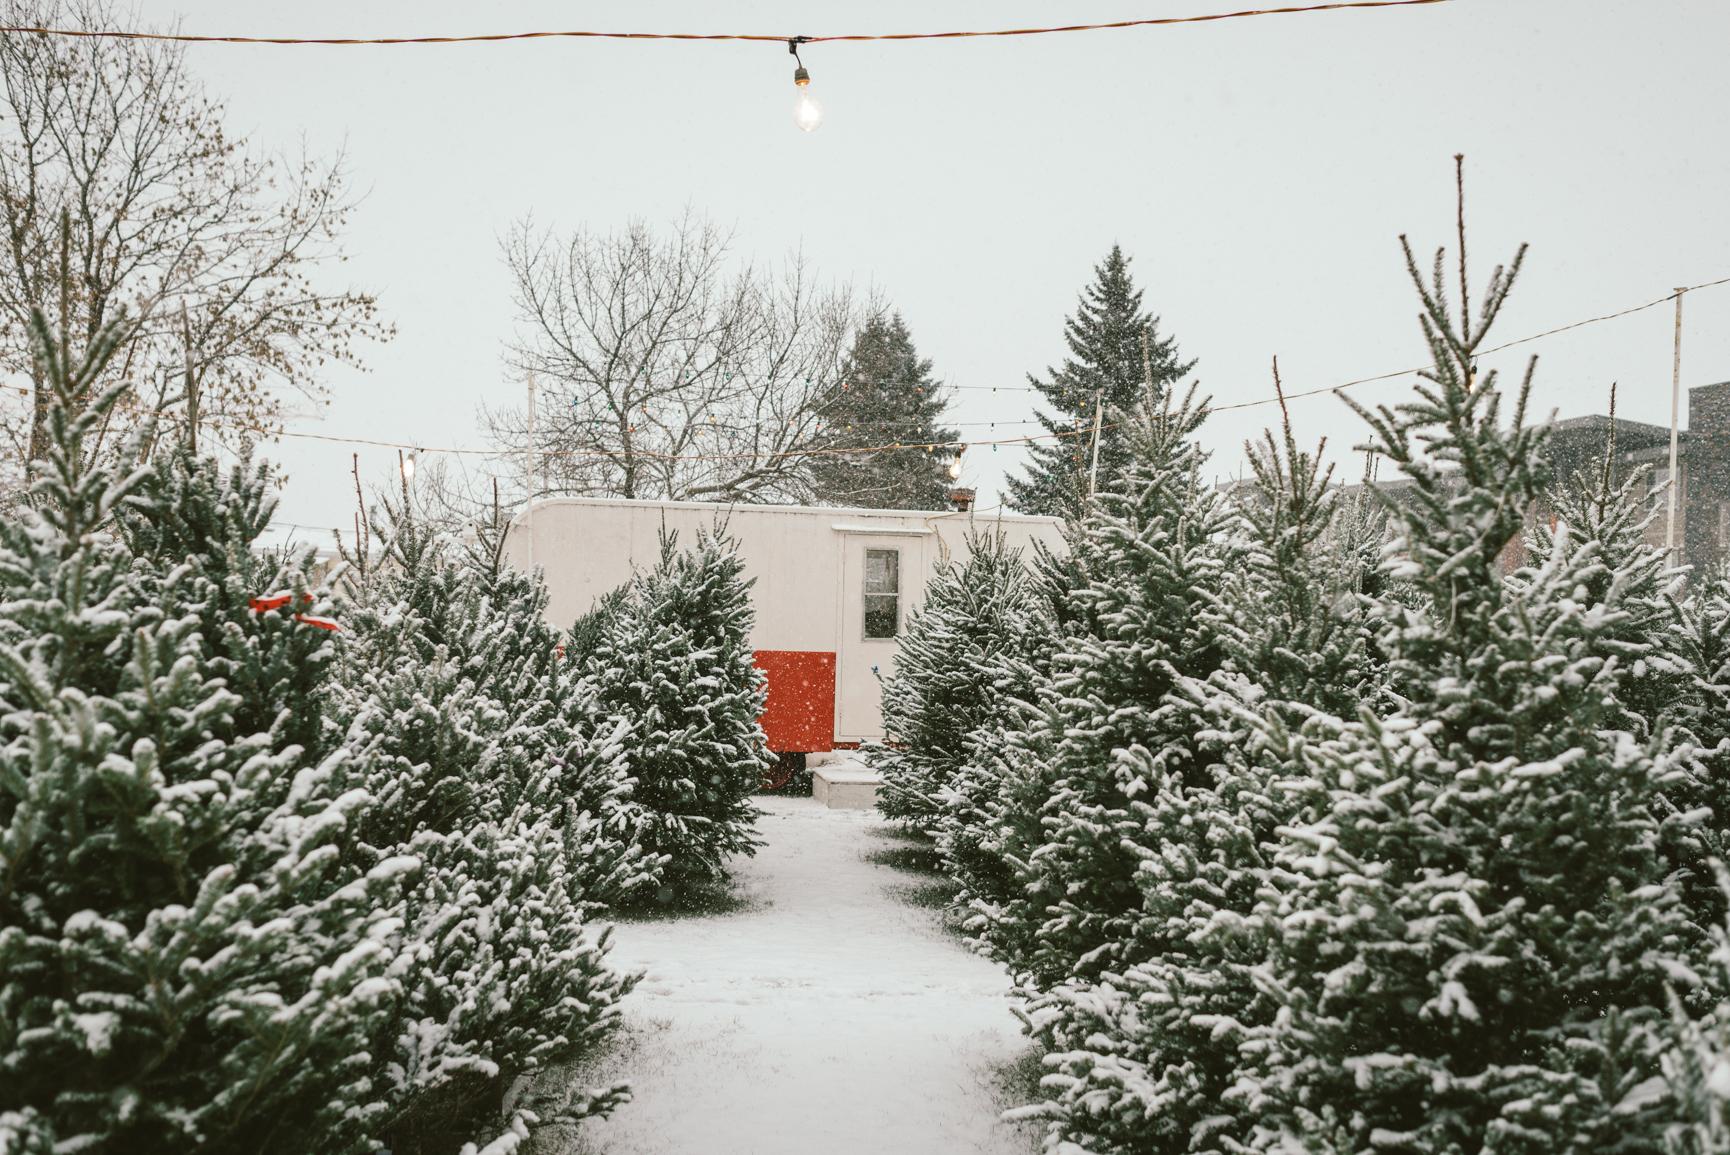 161204-113450-December-a1-1737.jpg